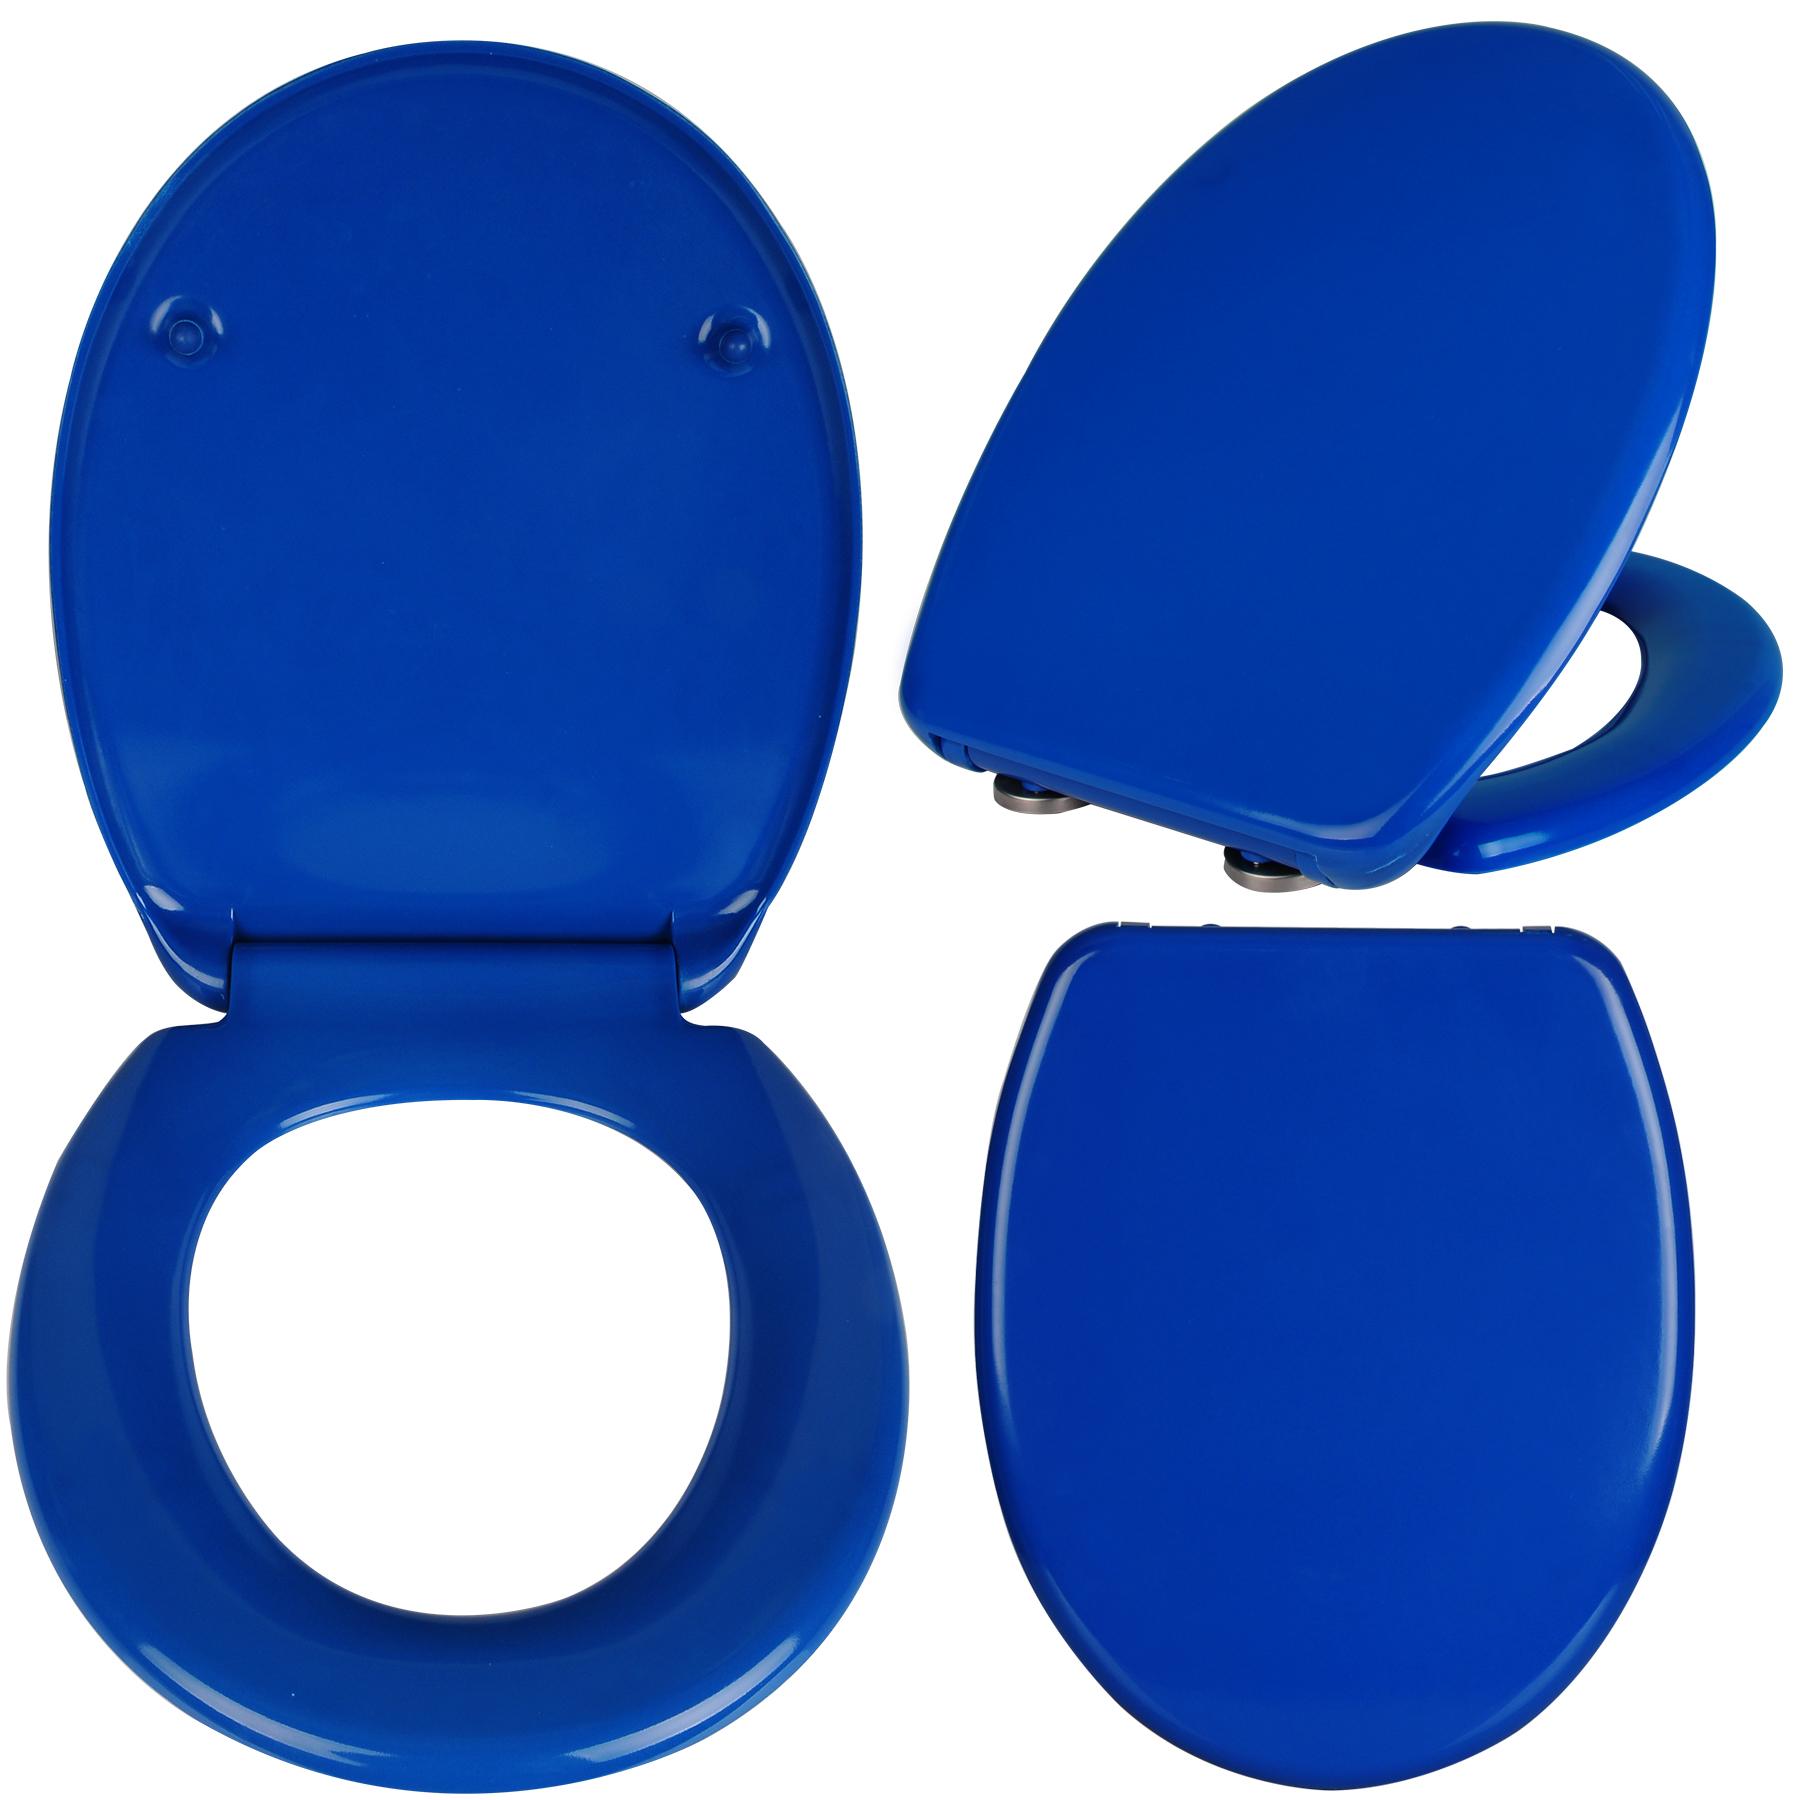 toilettensitz wc sitz softclose absenkautomatik klodeckel toilettendeckel 122 ebay. Black Bedroom Furniture Sets. Home Design Ideas